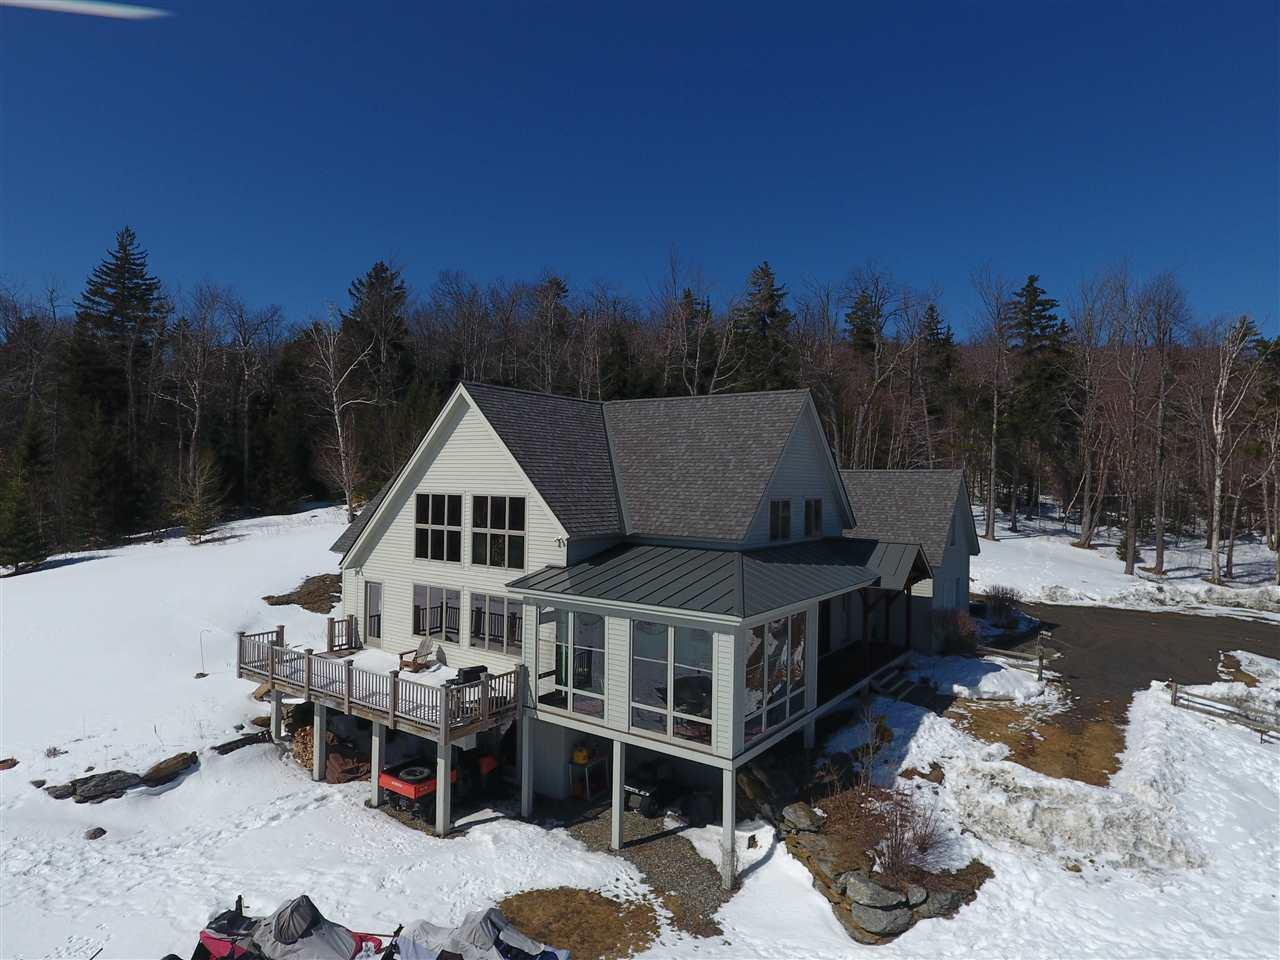 Mount-Snow-Real-Estate-4502410-28